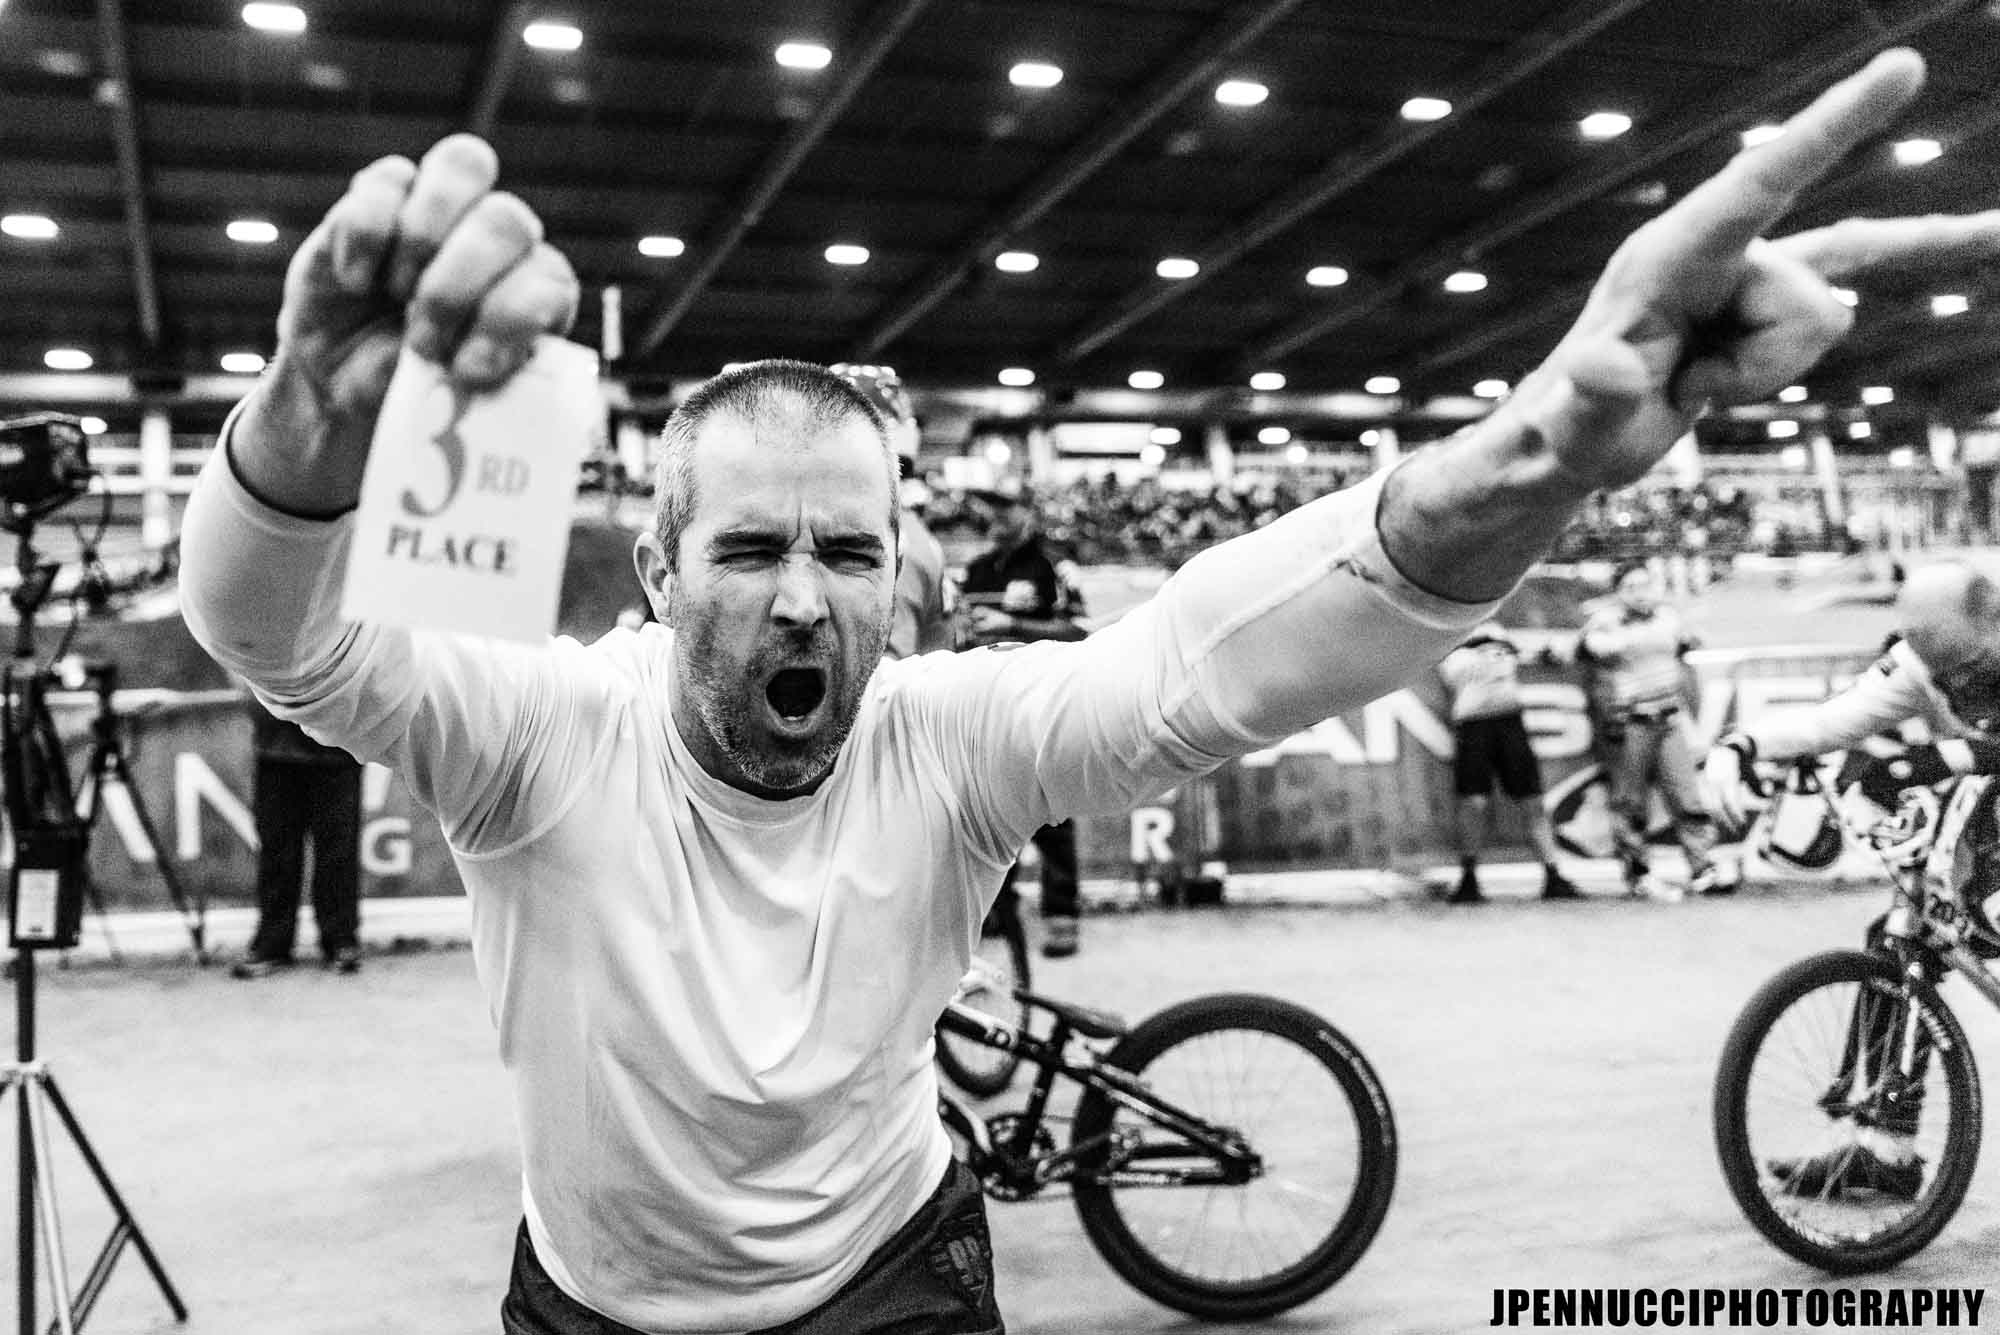 USA BMX Grands 2018 - Newly minted Aussie Brent Lee - JPennucci Photography